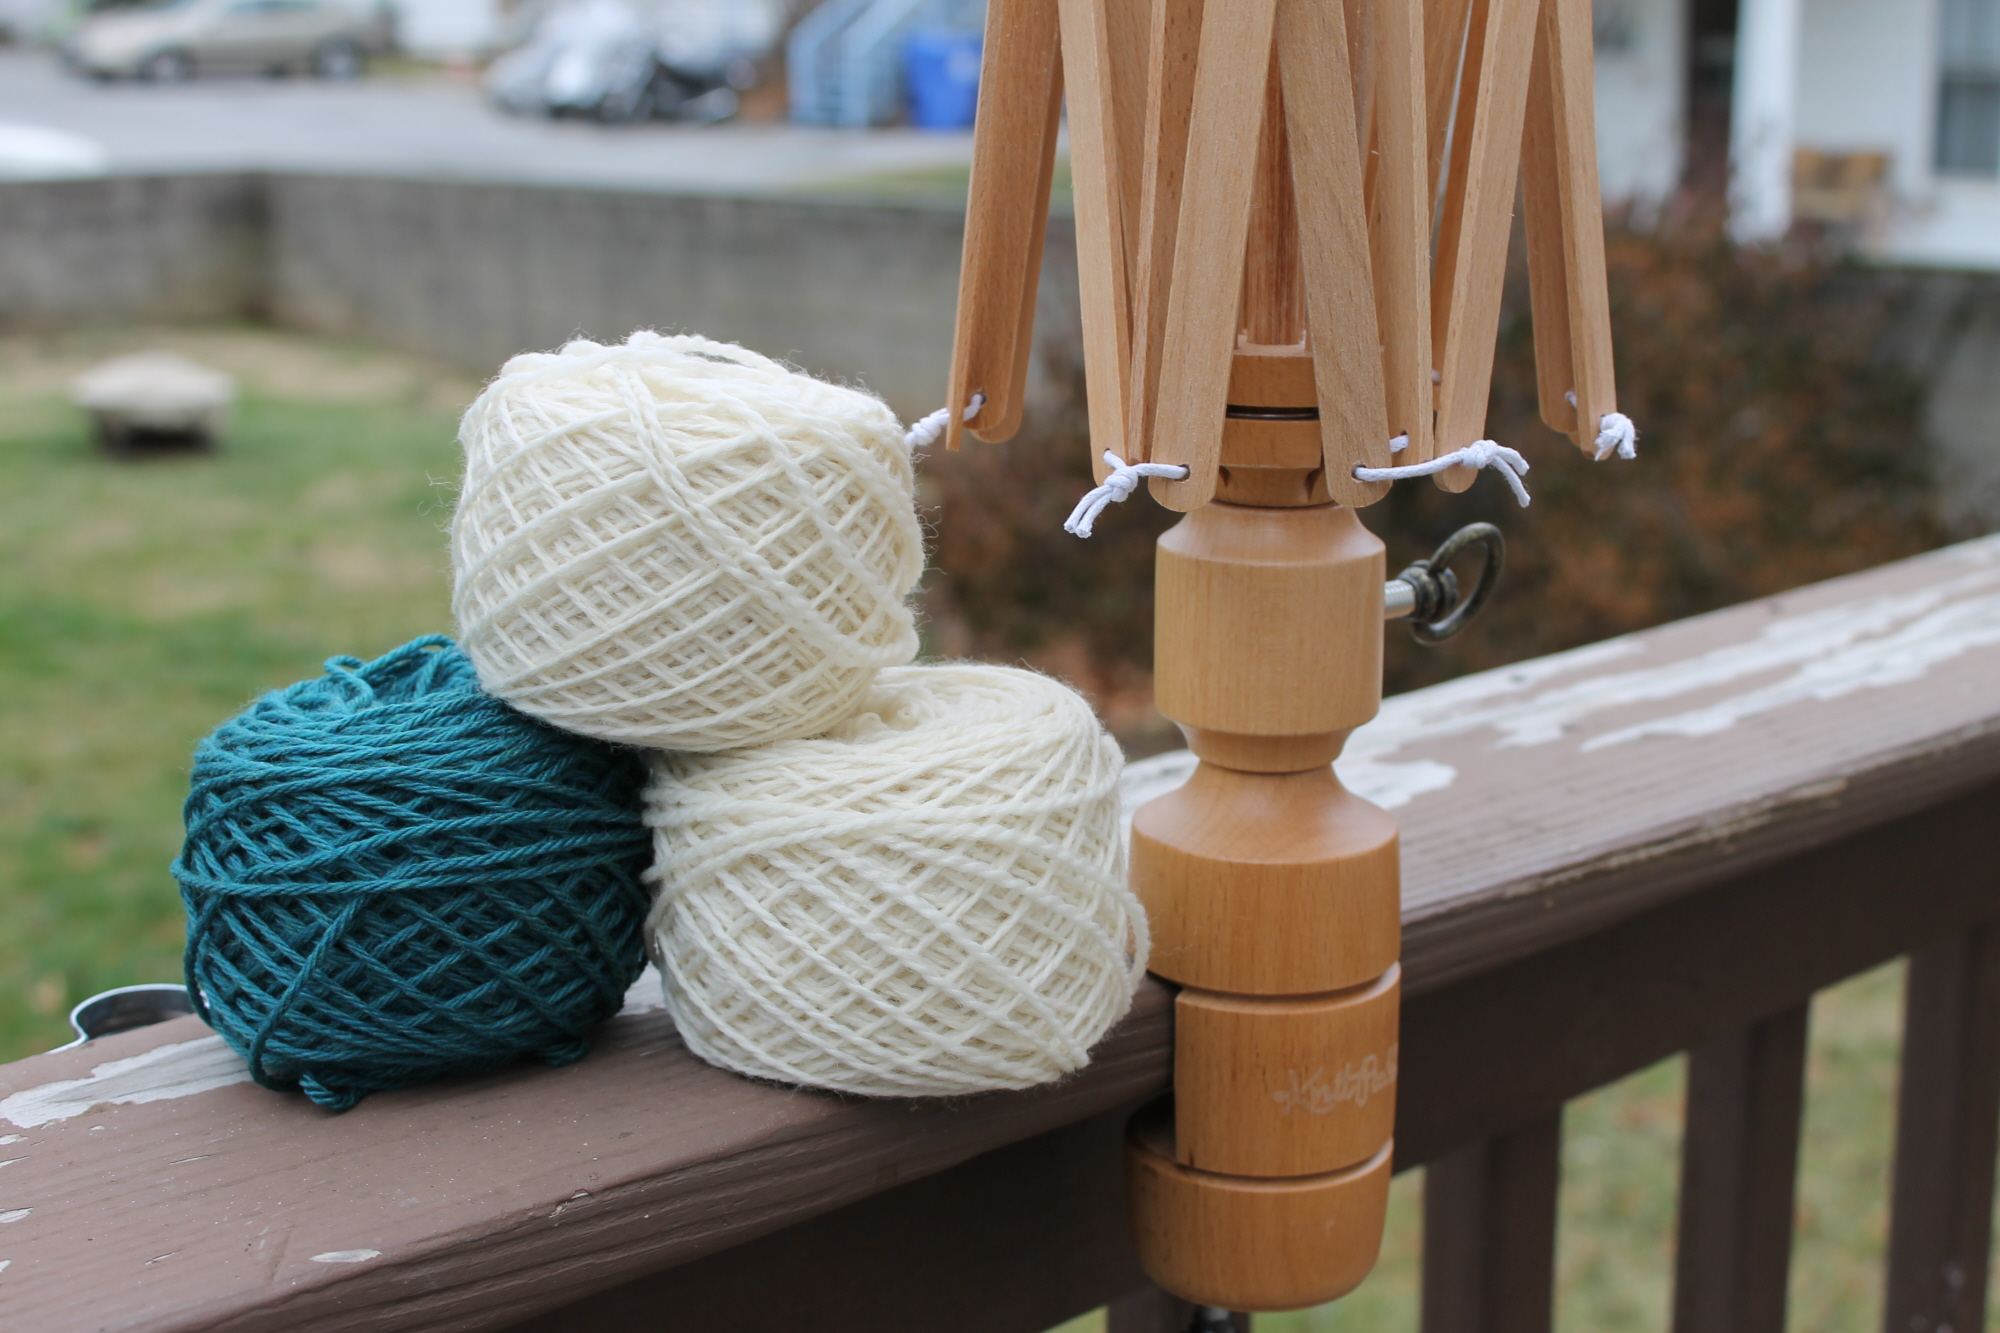 How to use a yarn swift